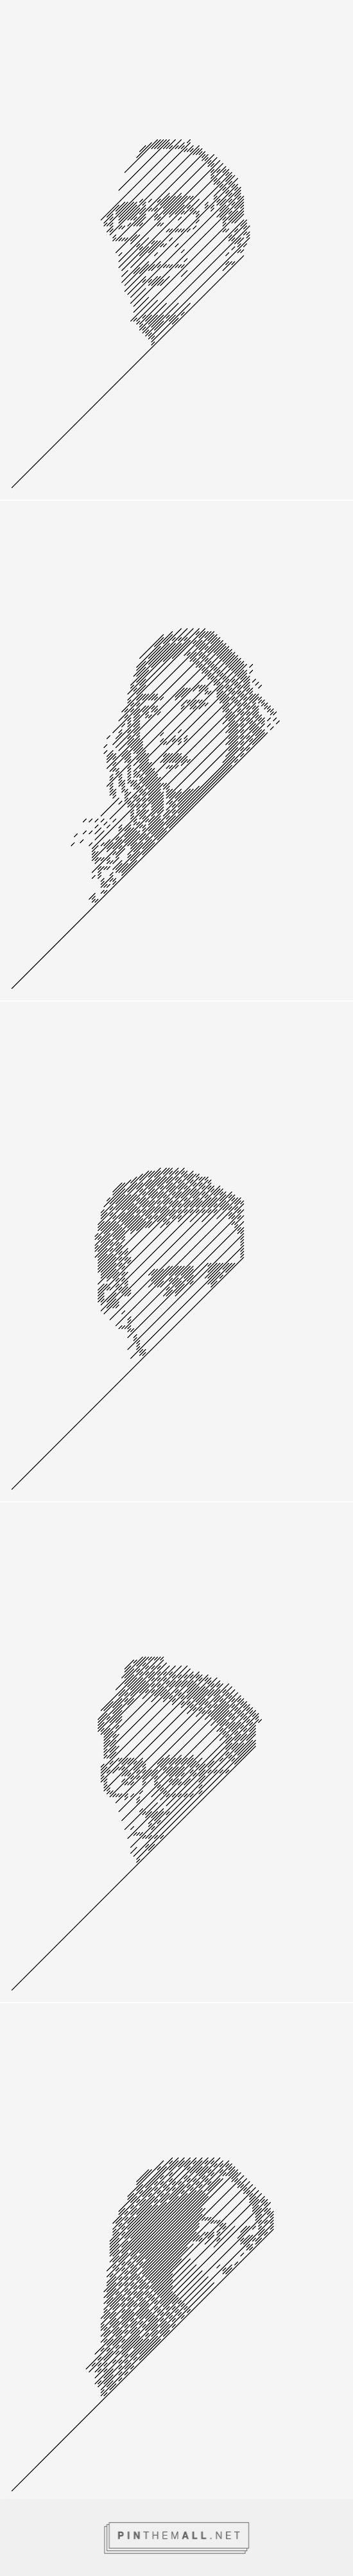 Melvin Galapon - Slash Portraits